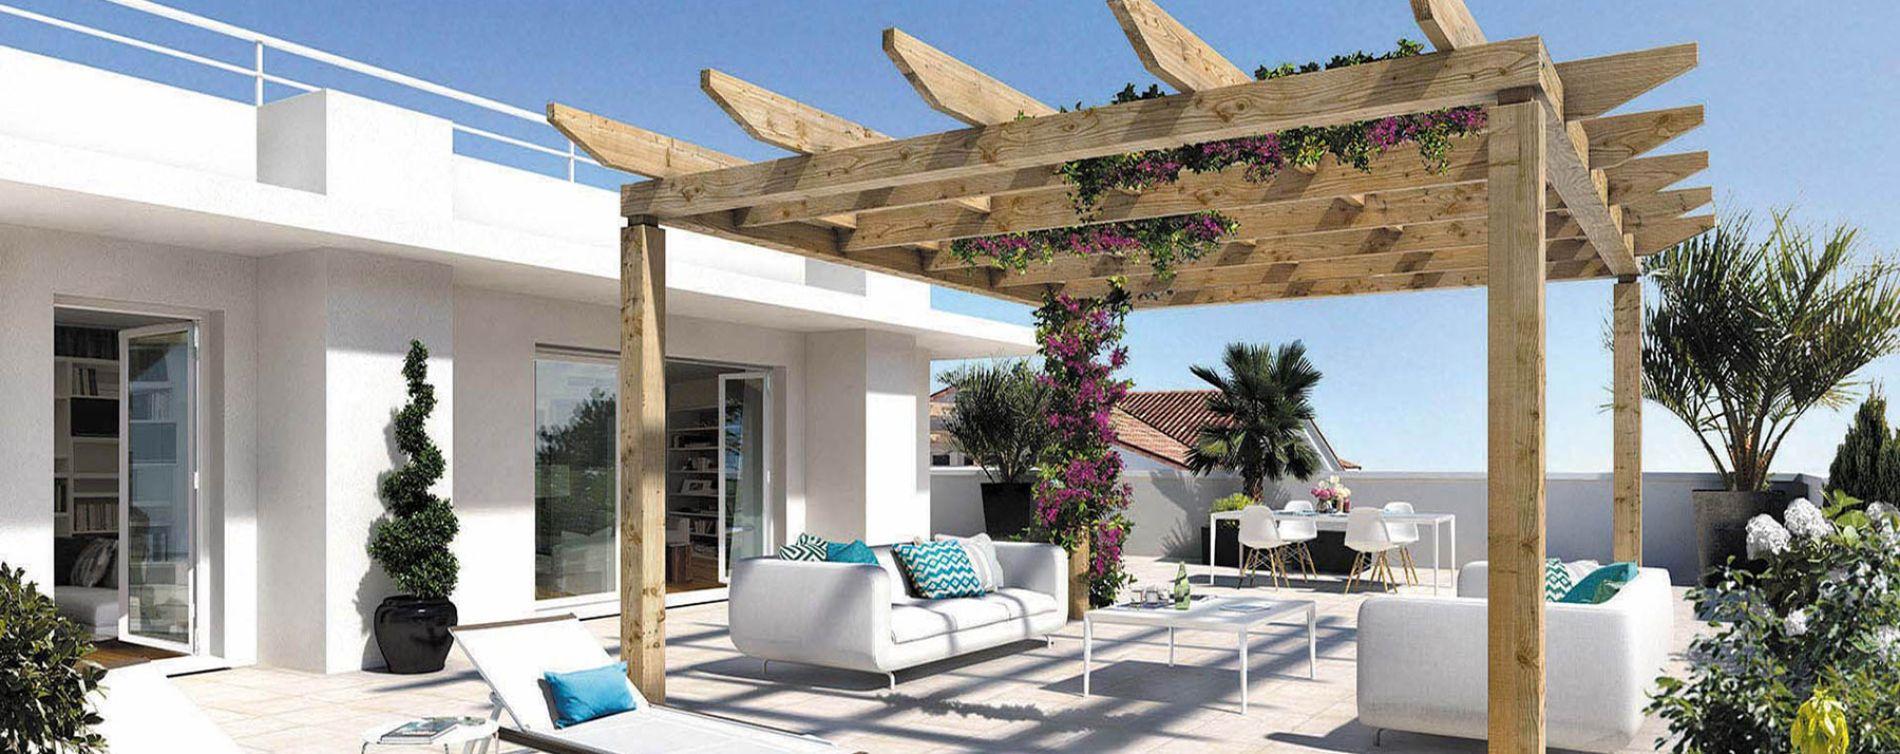 La Garde : programme immobilier neuve « Villa Vert Marine » (3)